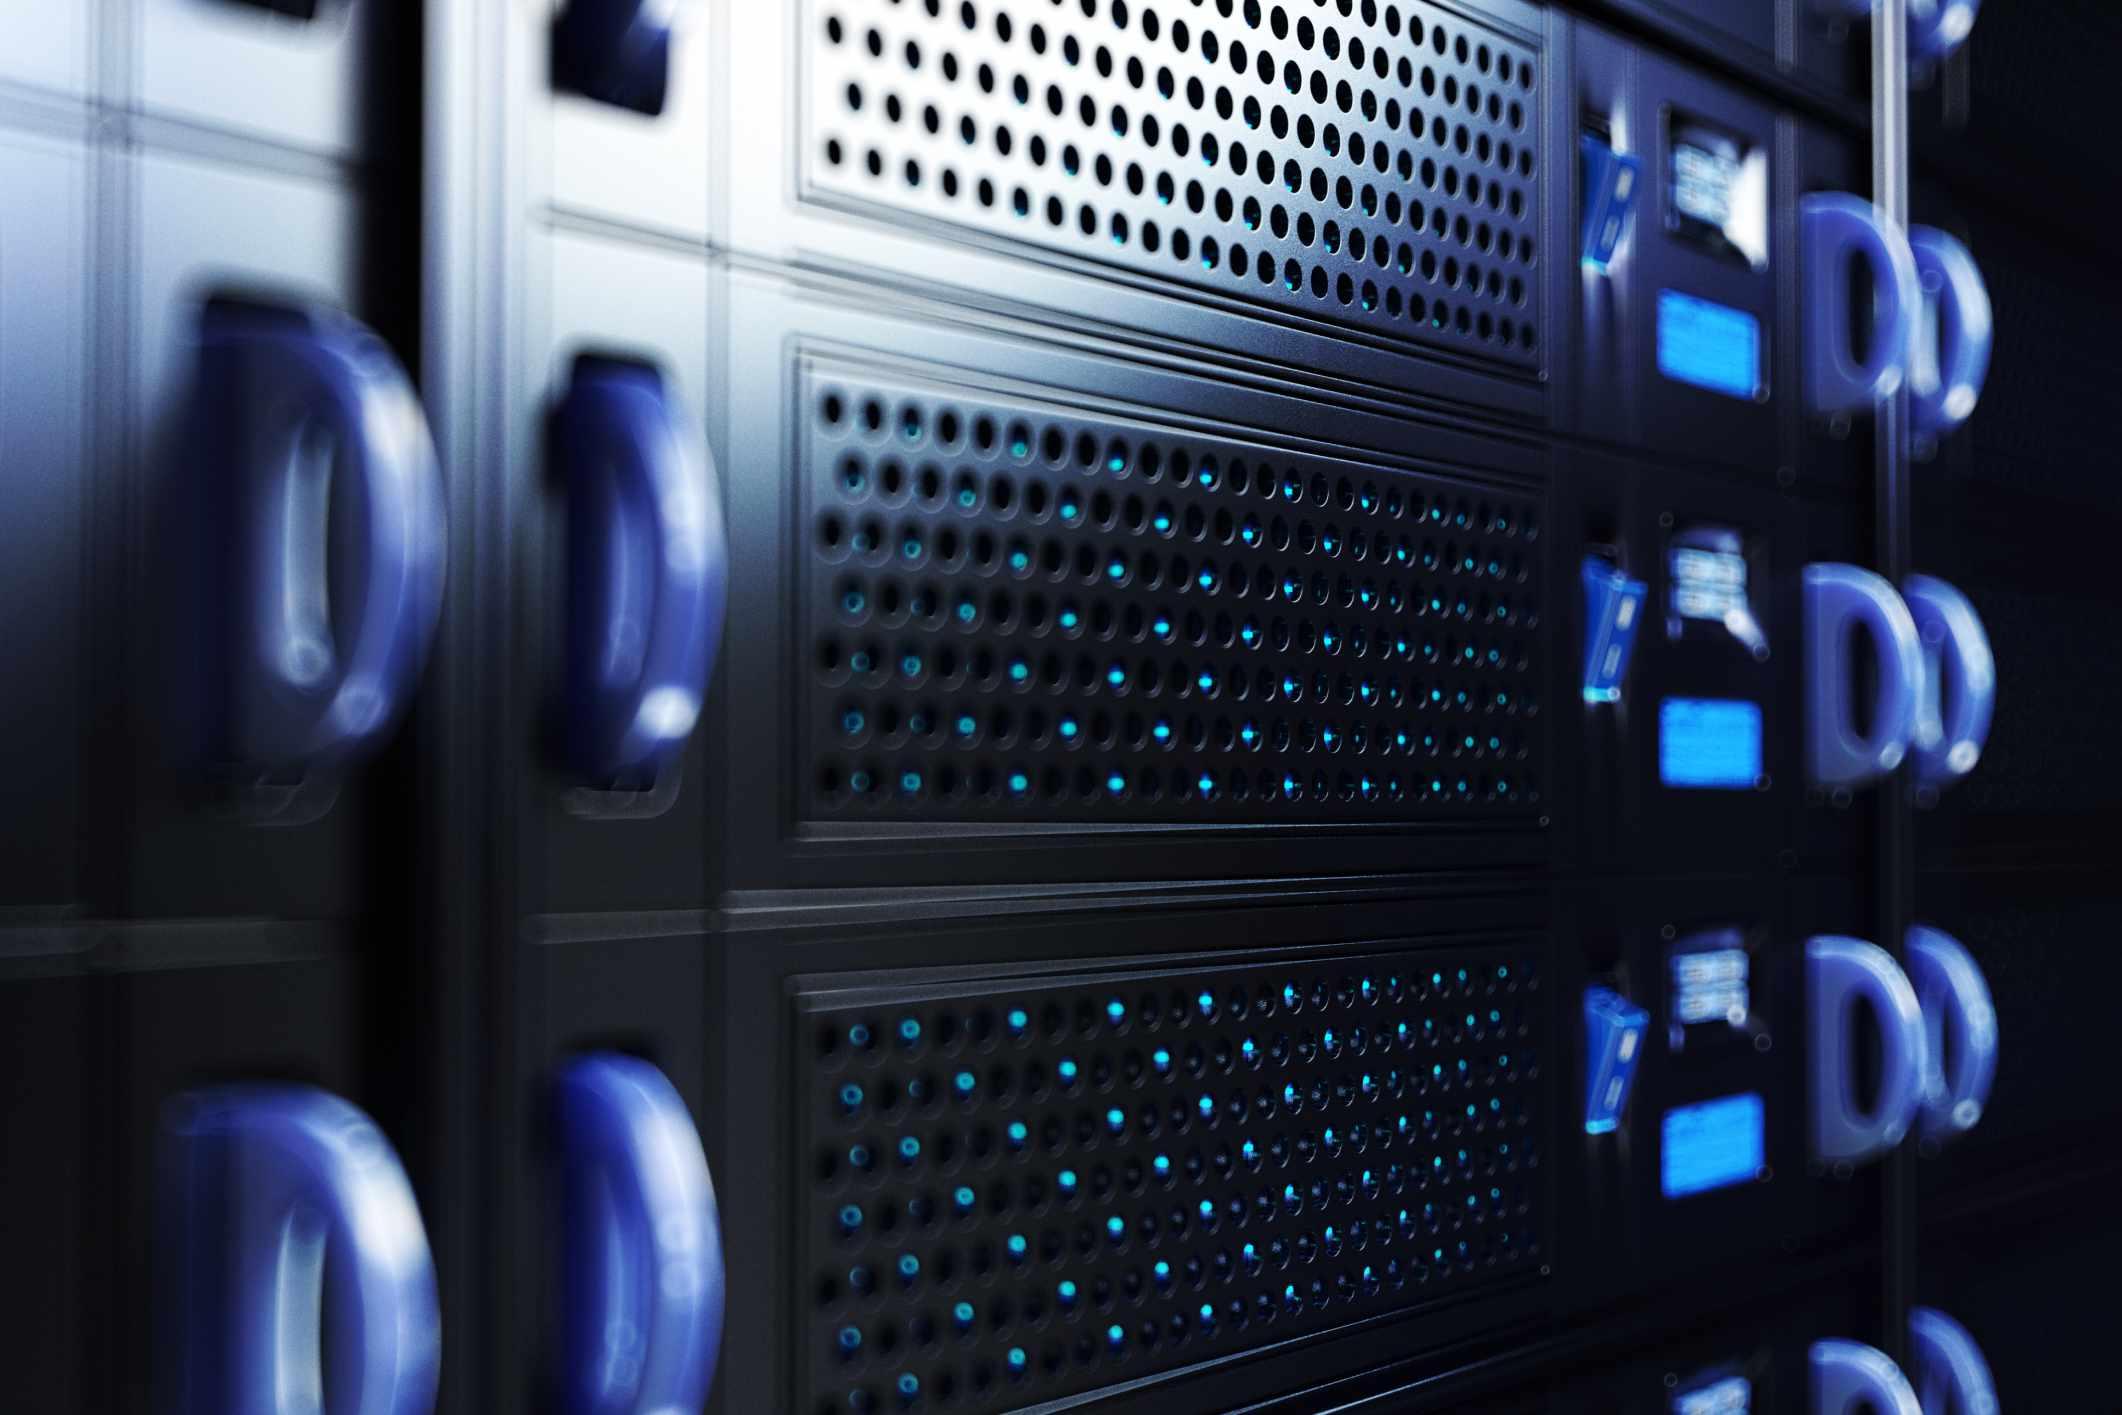 server-rack-units-Maciej-Frolow-Photographers-Choice-RF-Getty-Images.jpg